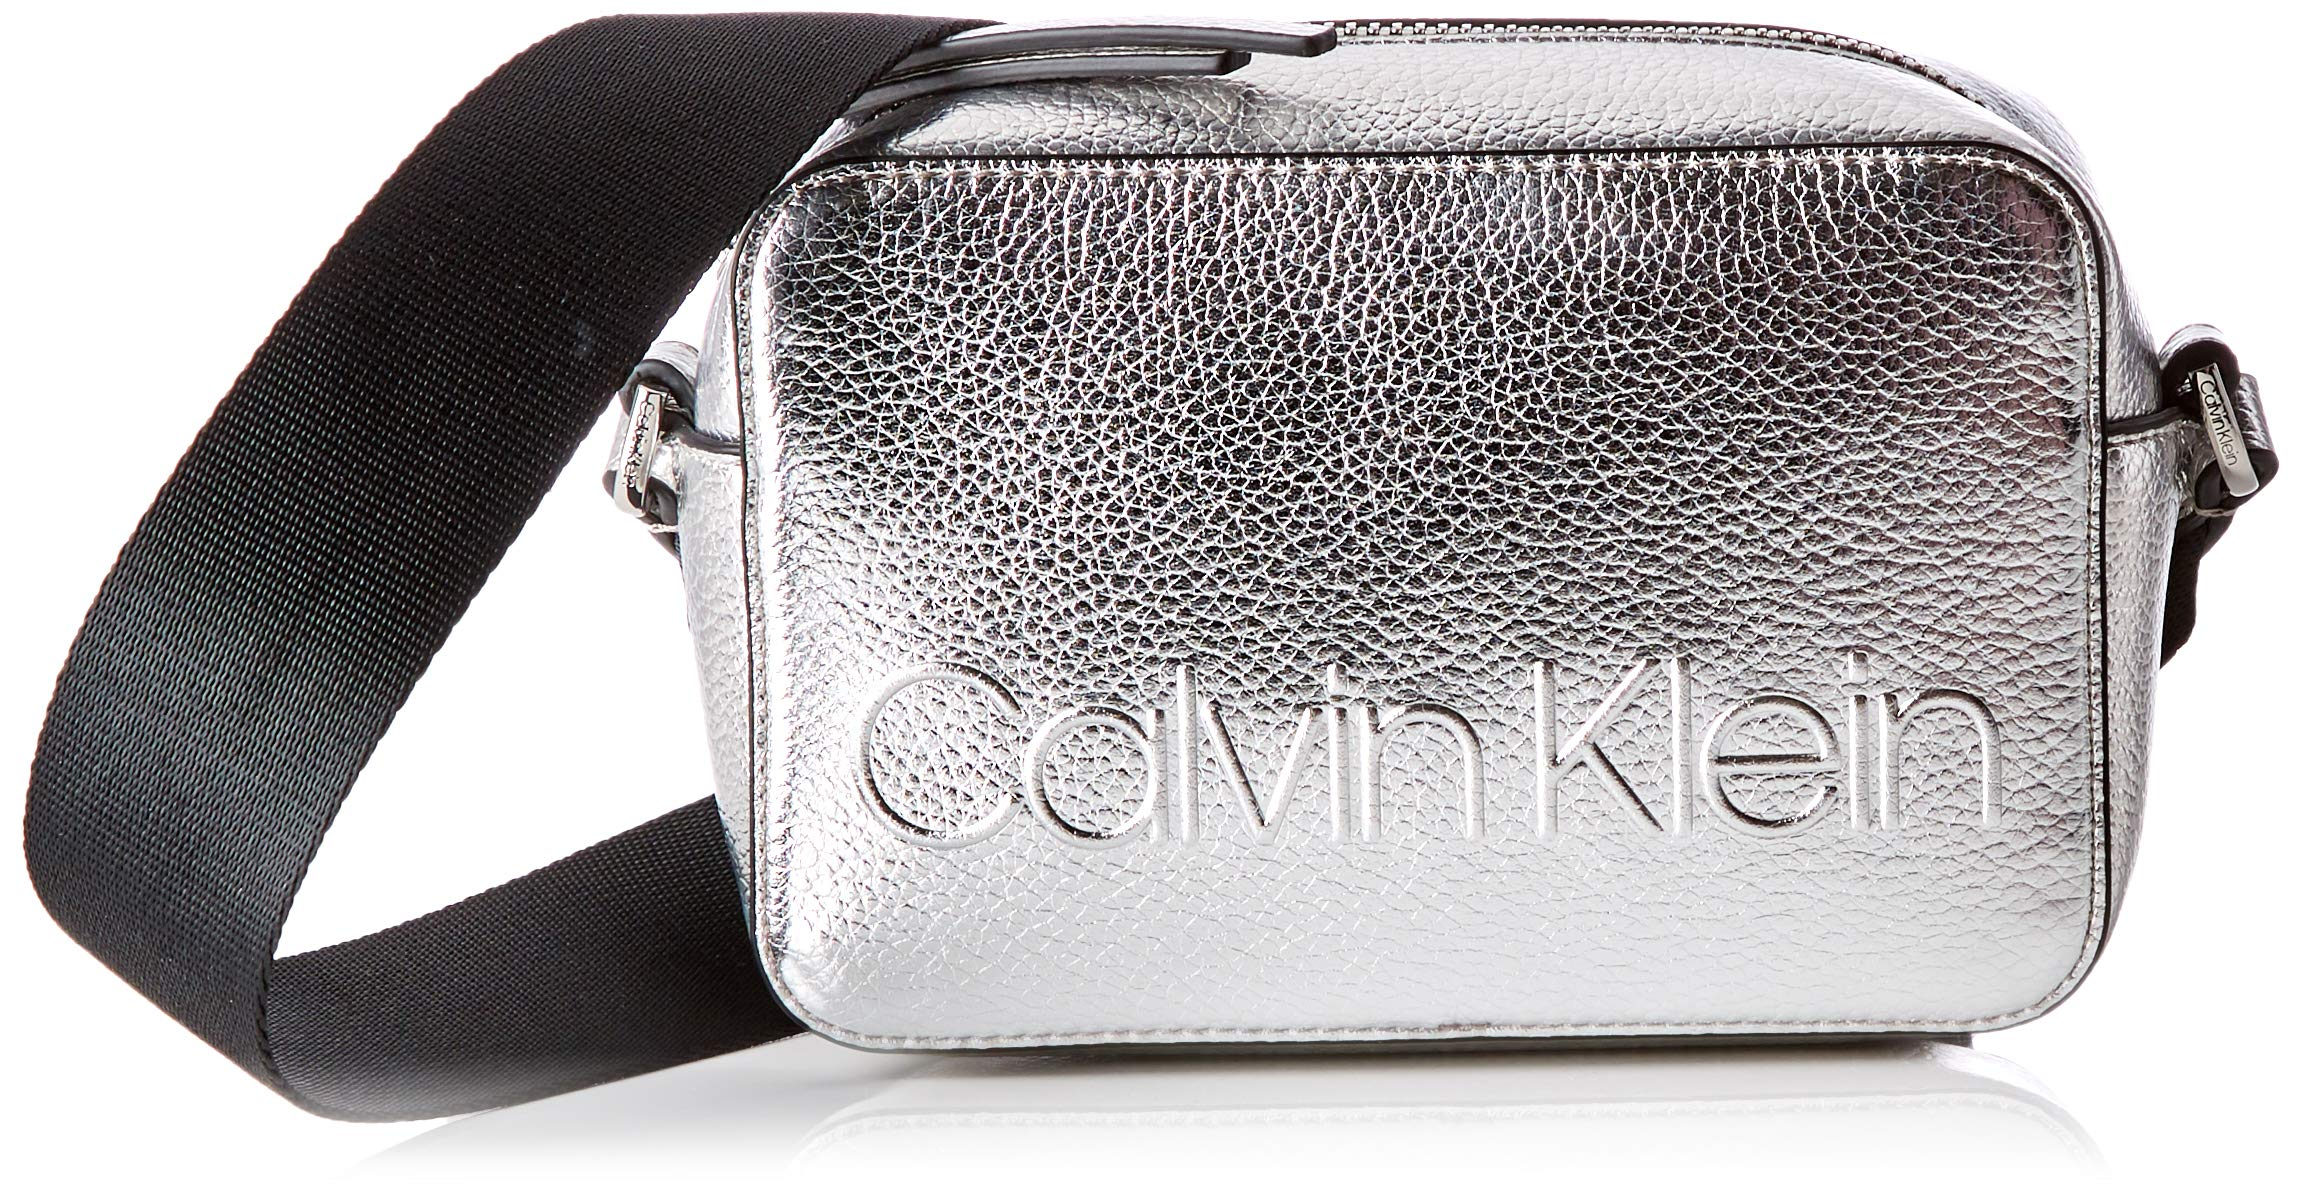 Calvin Klein – Edged Camera Bag Met, Bolsos bandolera Mujer, Gris (Silver), 7x12x18 cm (B x H T)